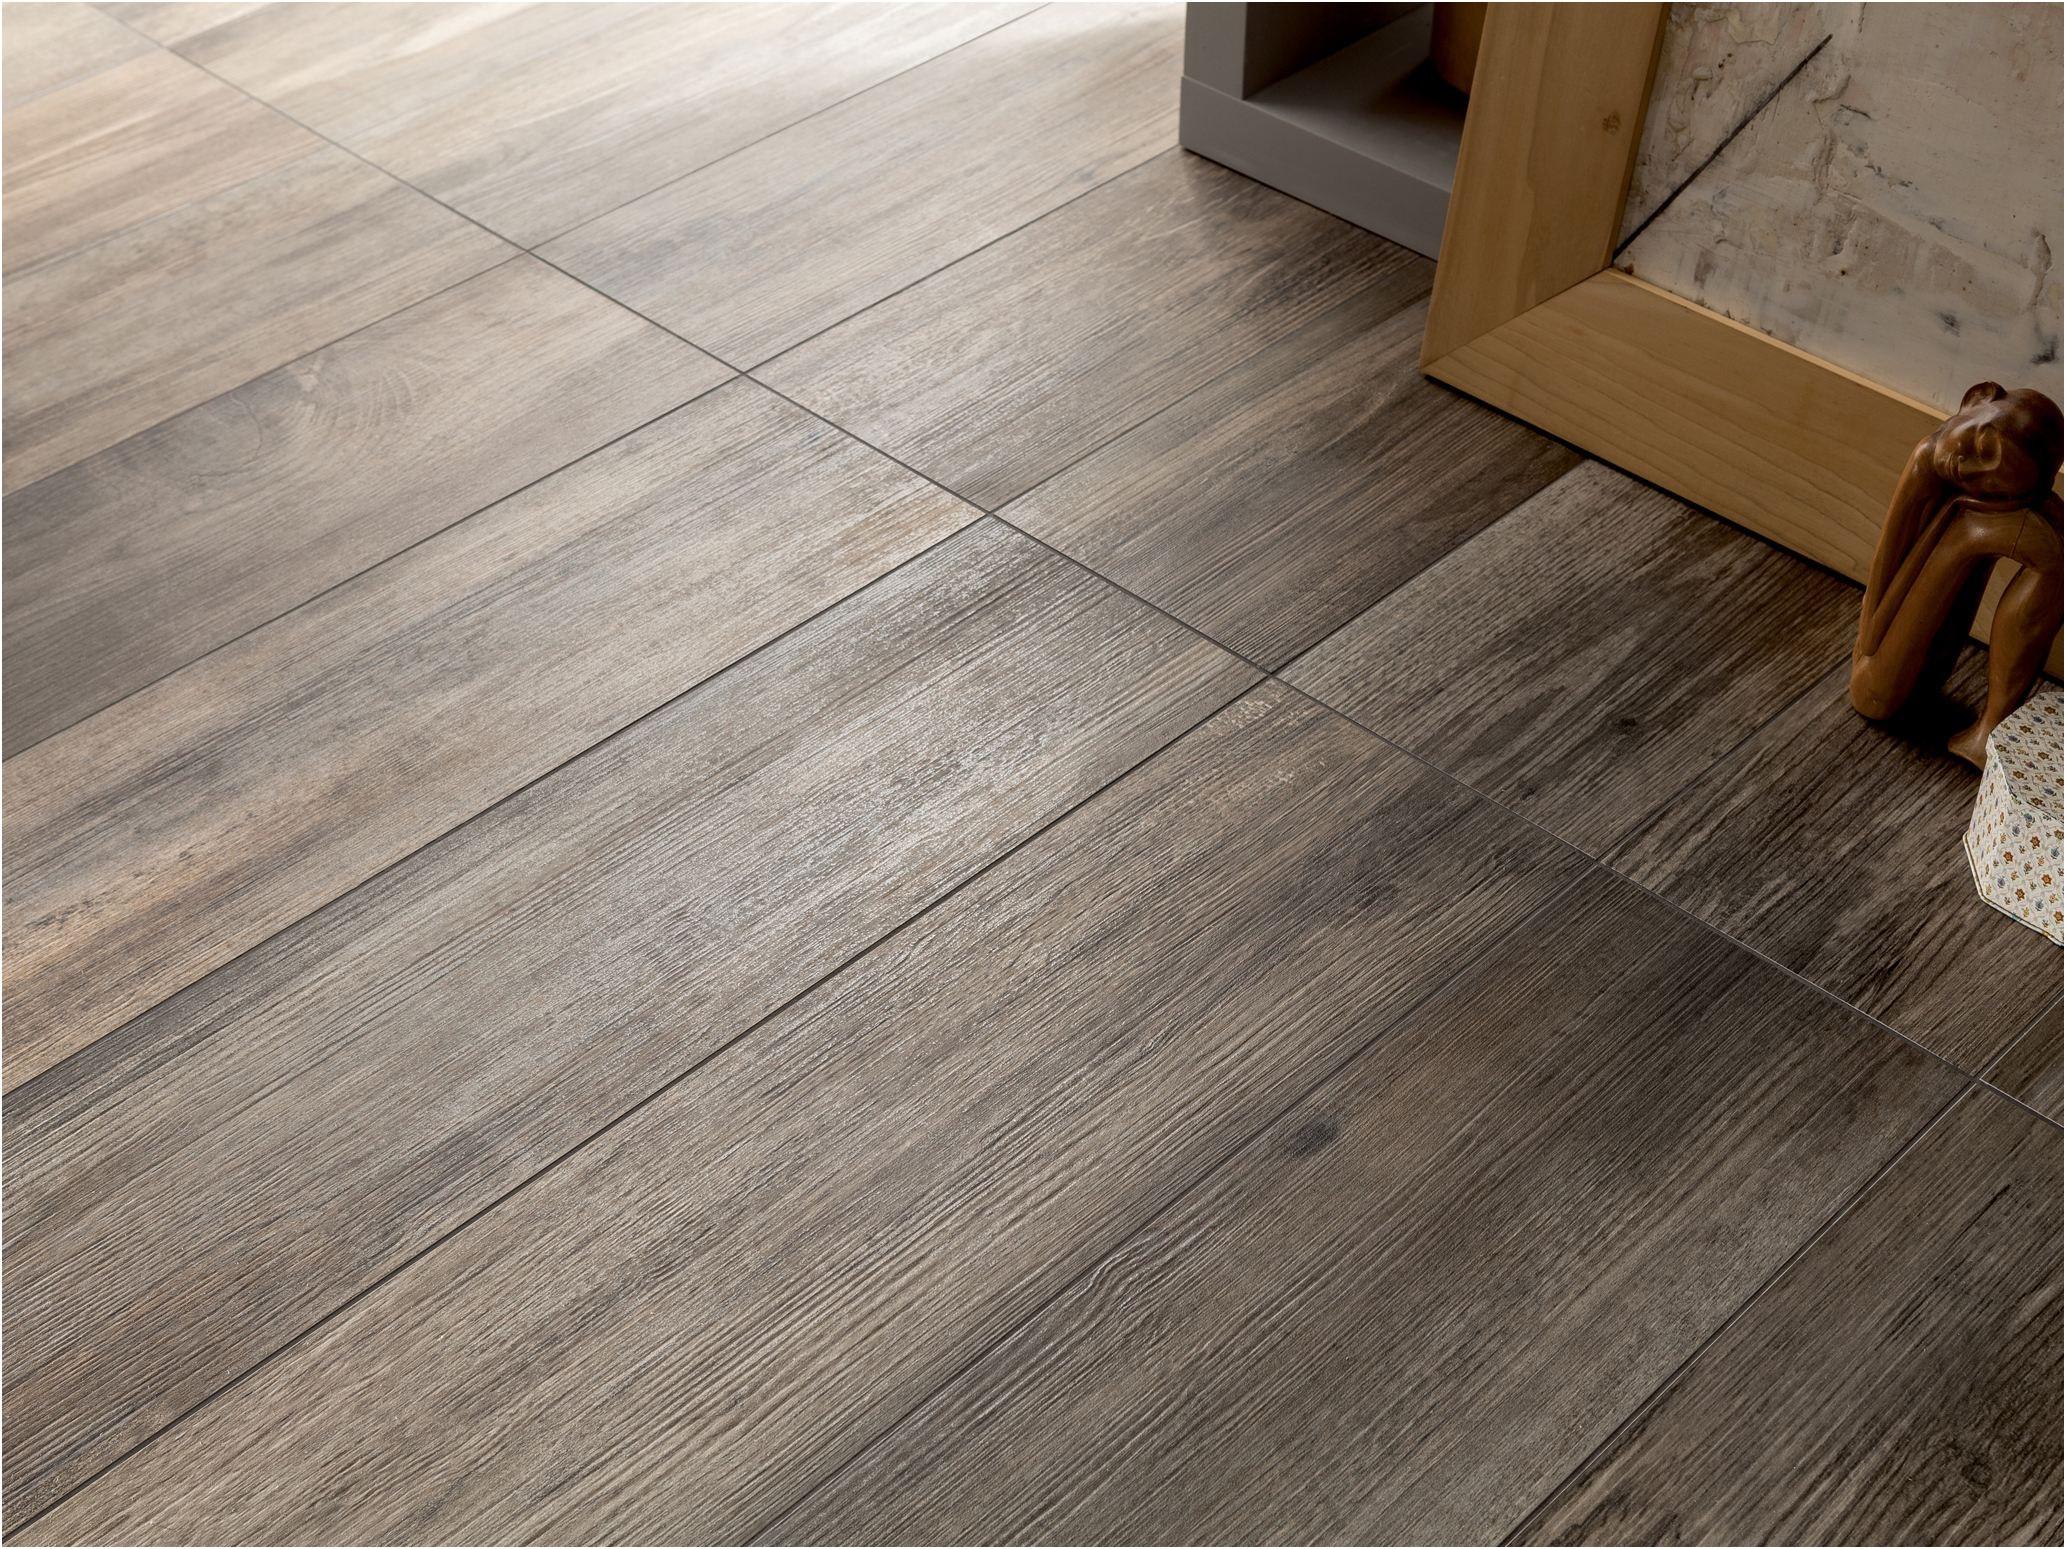 uneven hardwood floor repair of hardwood flooring over ceramic tile galerie kitchen amazing ceramic regarding hardwood flooring over ceramic tile galerie kitchen amazing ceramic tiles that look like hardwood floors